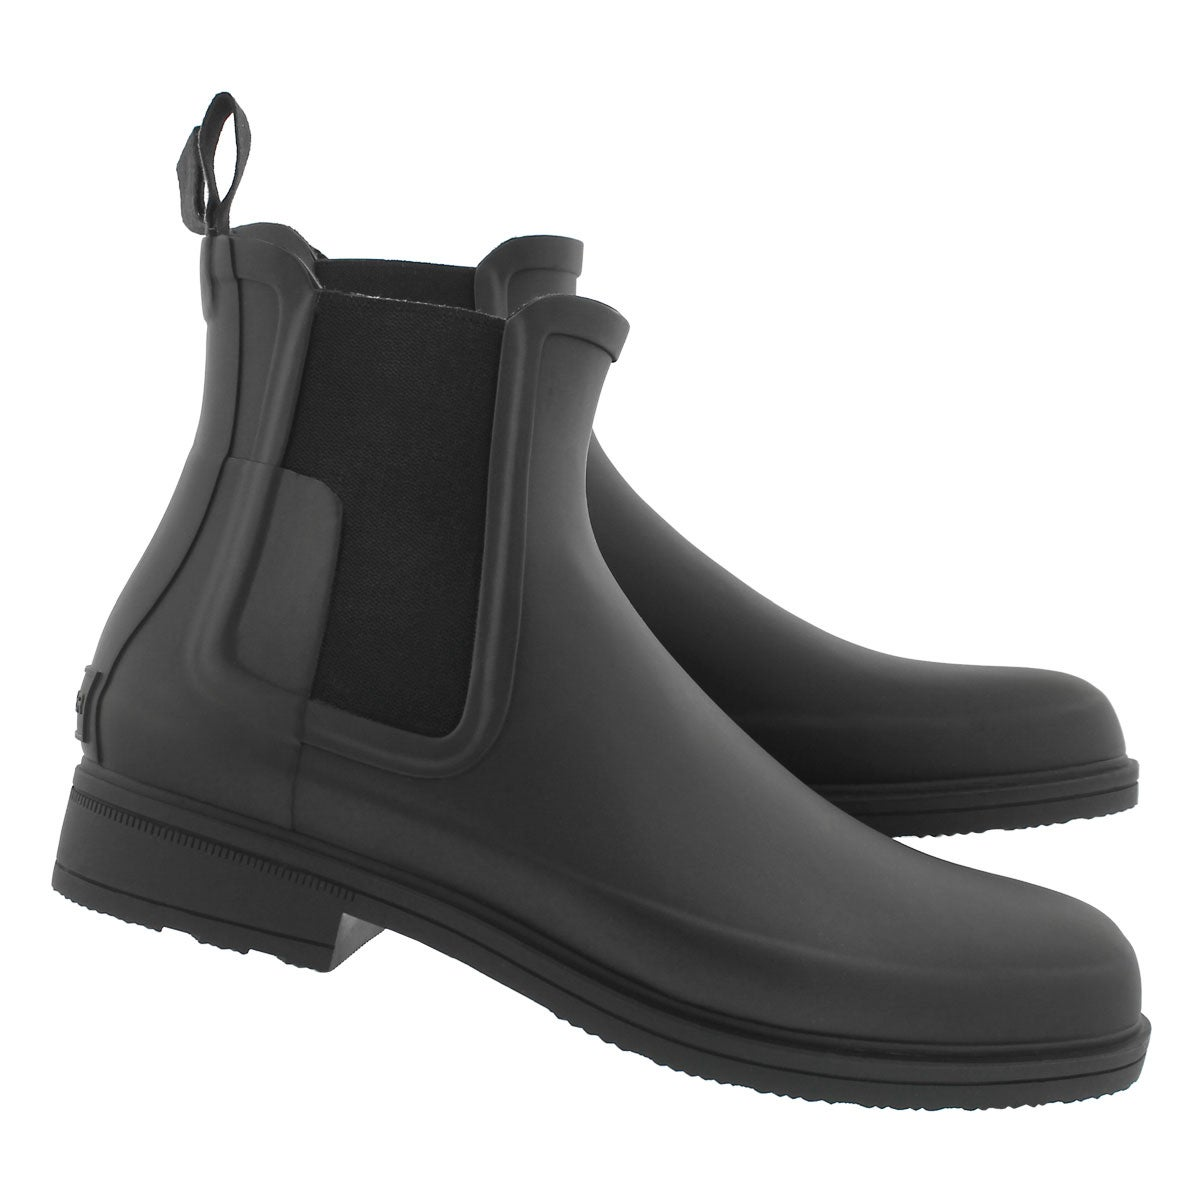 Mns OrgRefinedChelsea blk rainboot